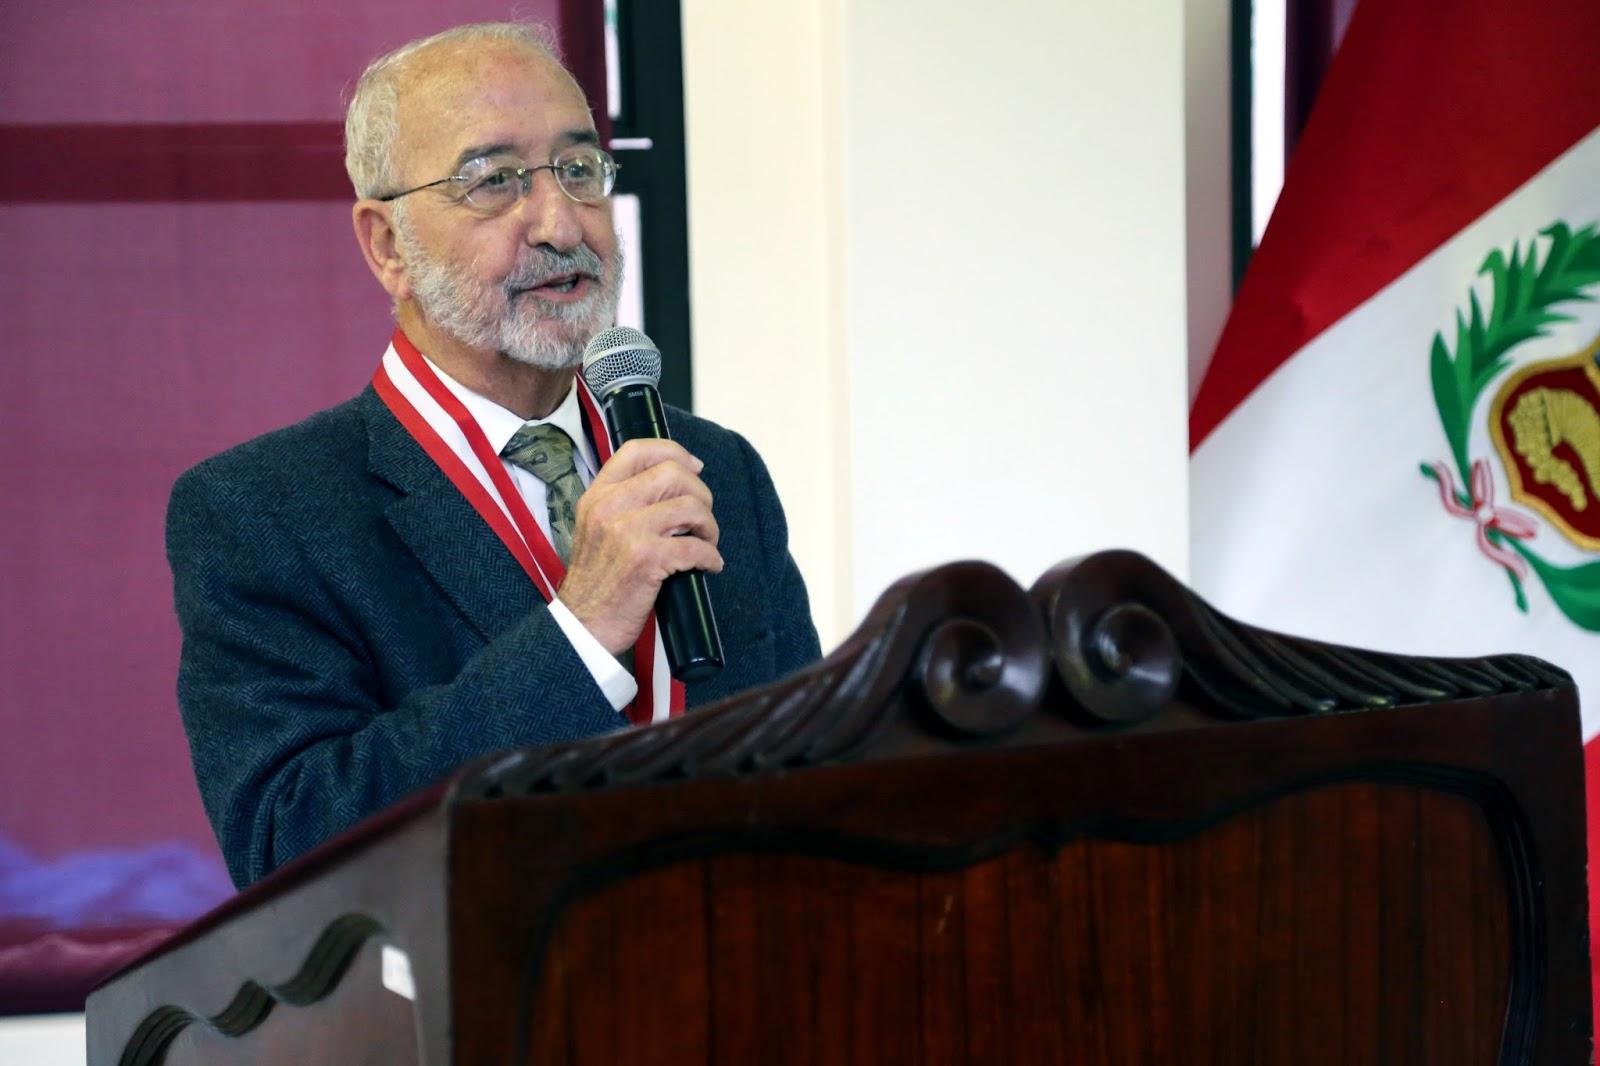 Dr. José López Soria brindó conferencia magistral sobre la UNI